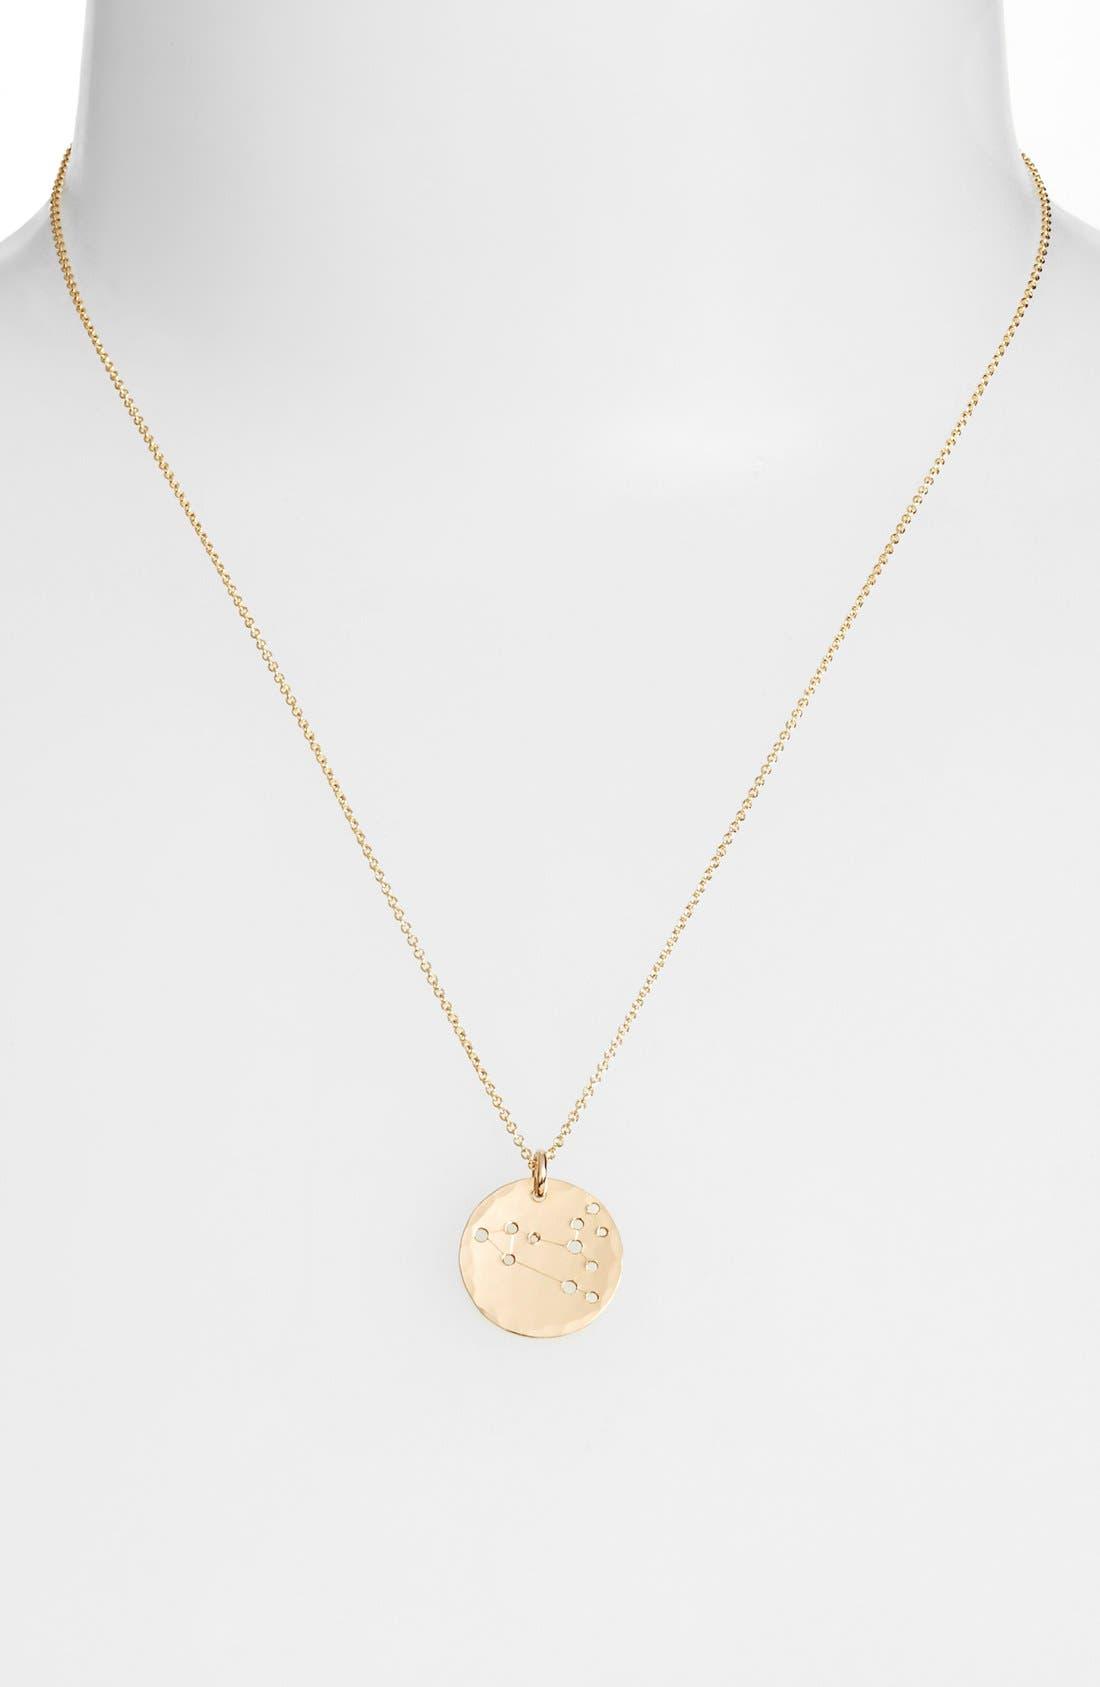 Ija 'Small Zodiac' 14k-Gold Fill Necklace,                             Alternate thumbnail 29, color,